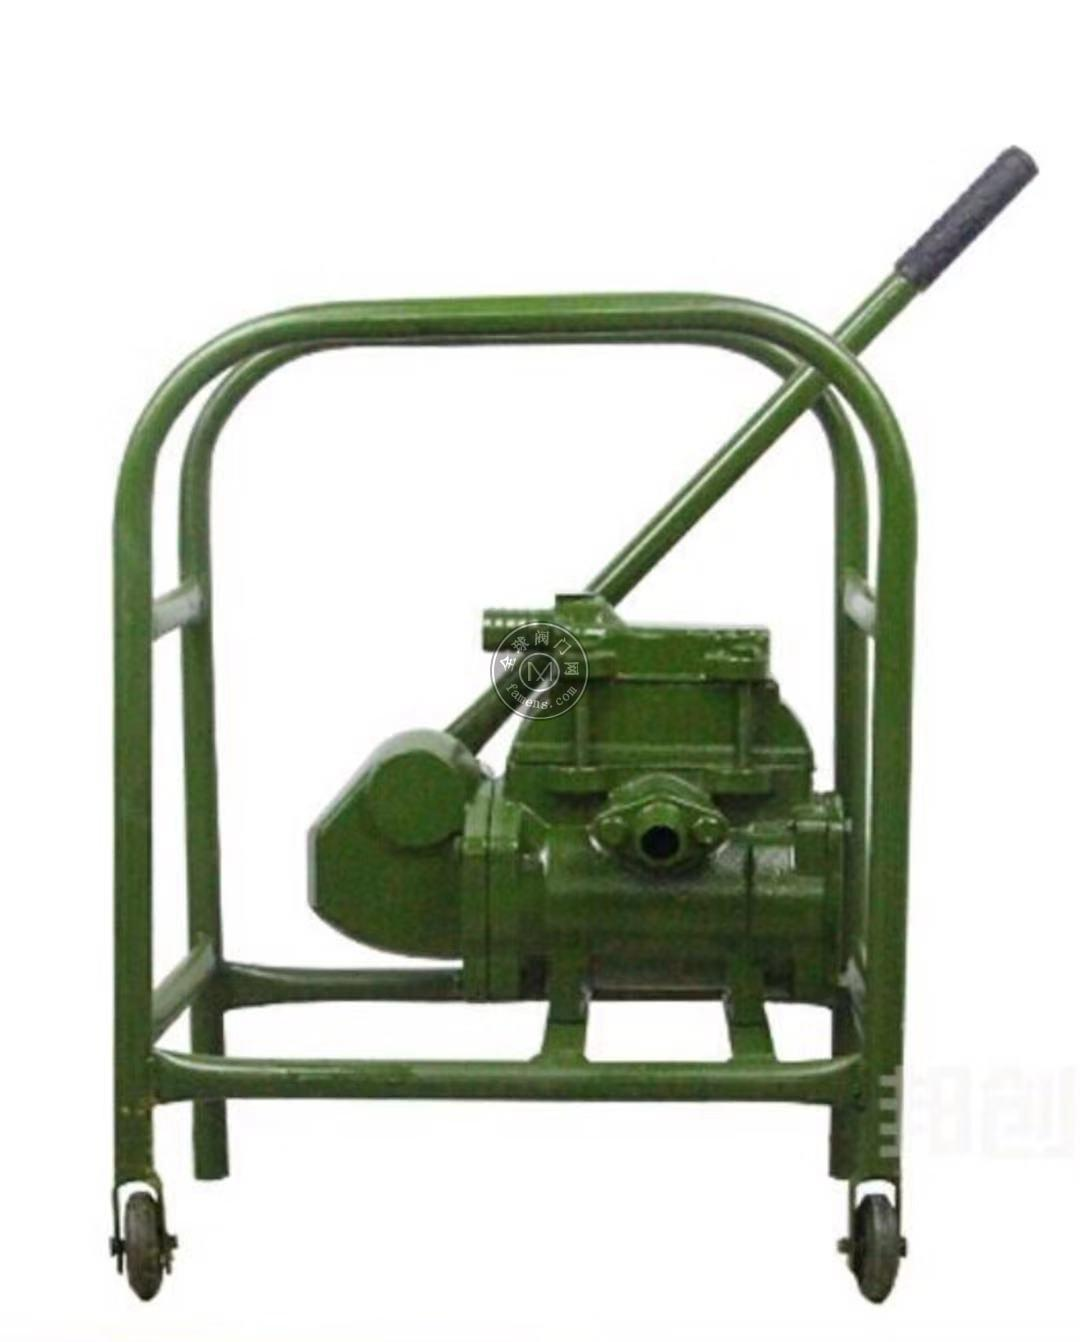 ZH-100A手摇计量加油泵顺源技术升级款操作简单